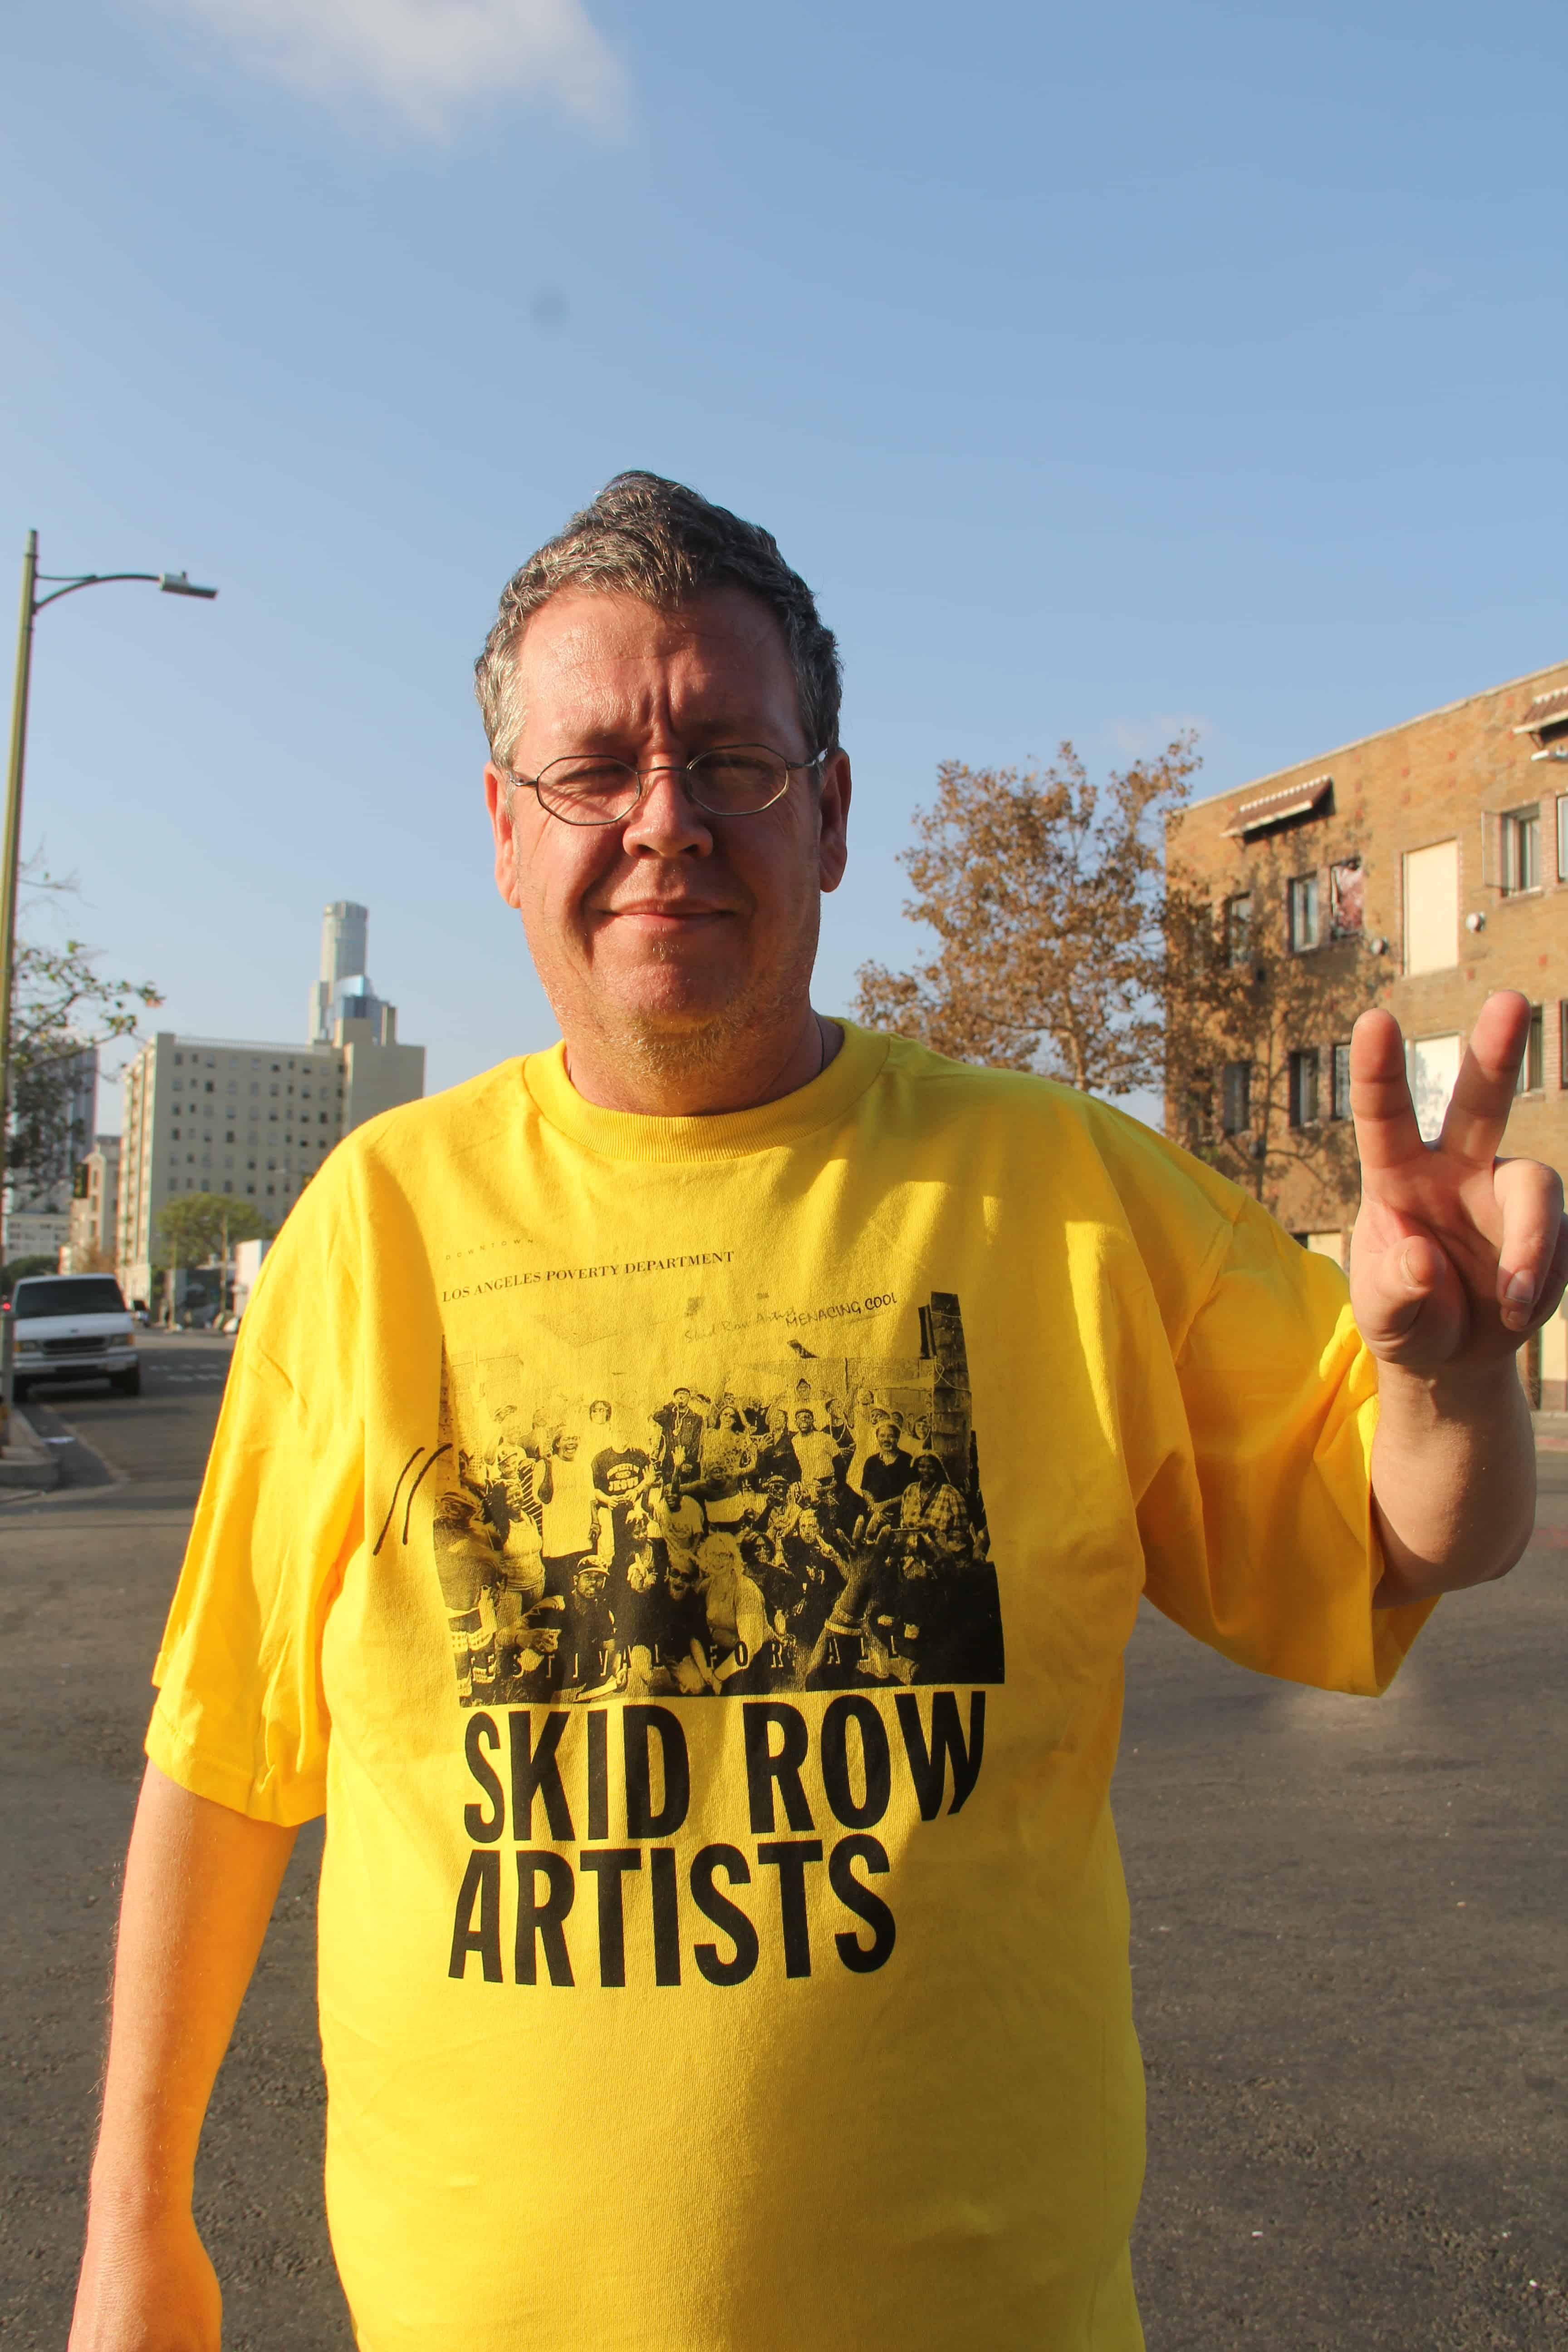 Skid Row Artists Festival For All Skid Row